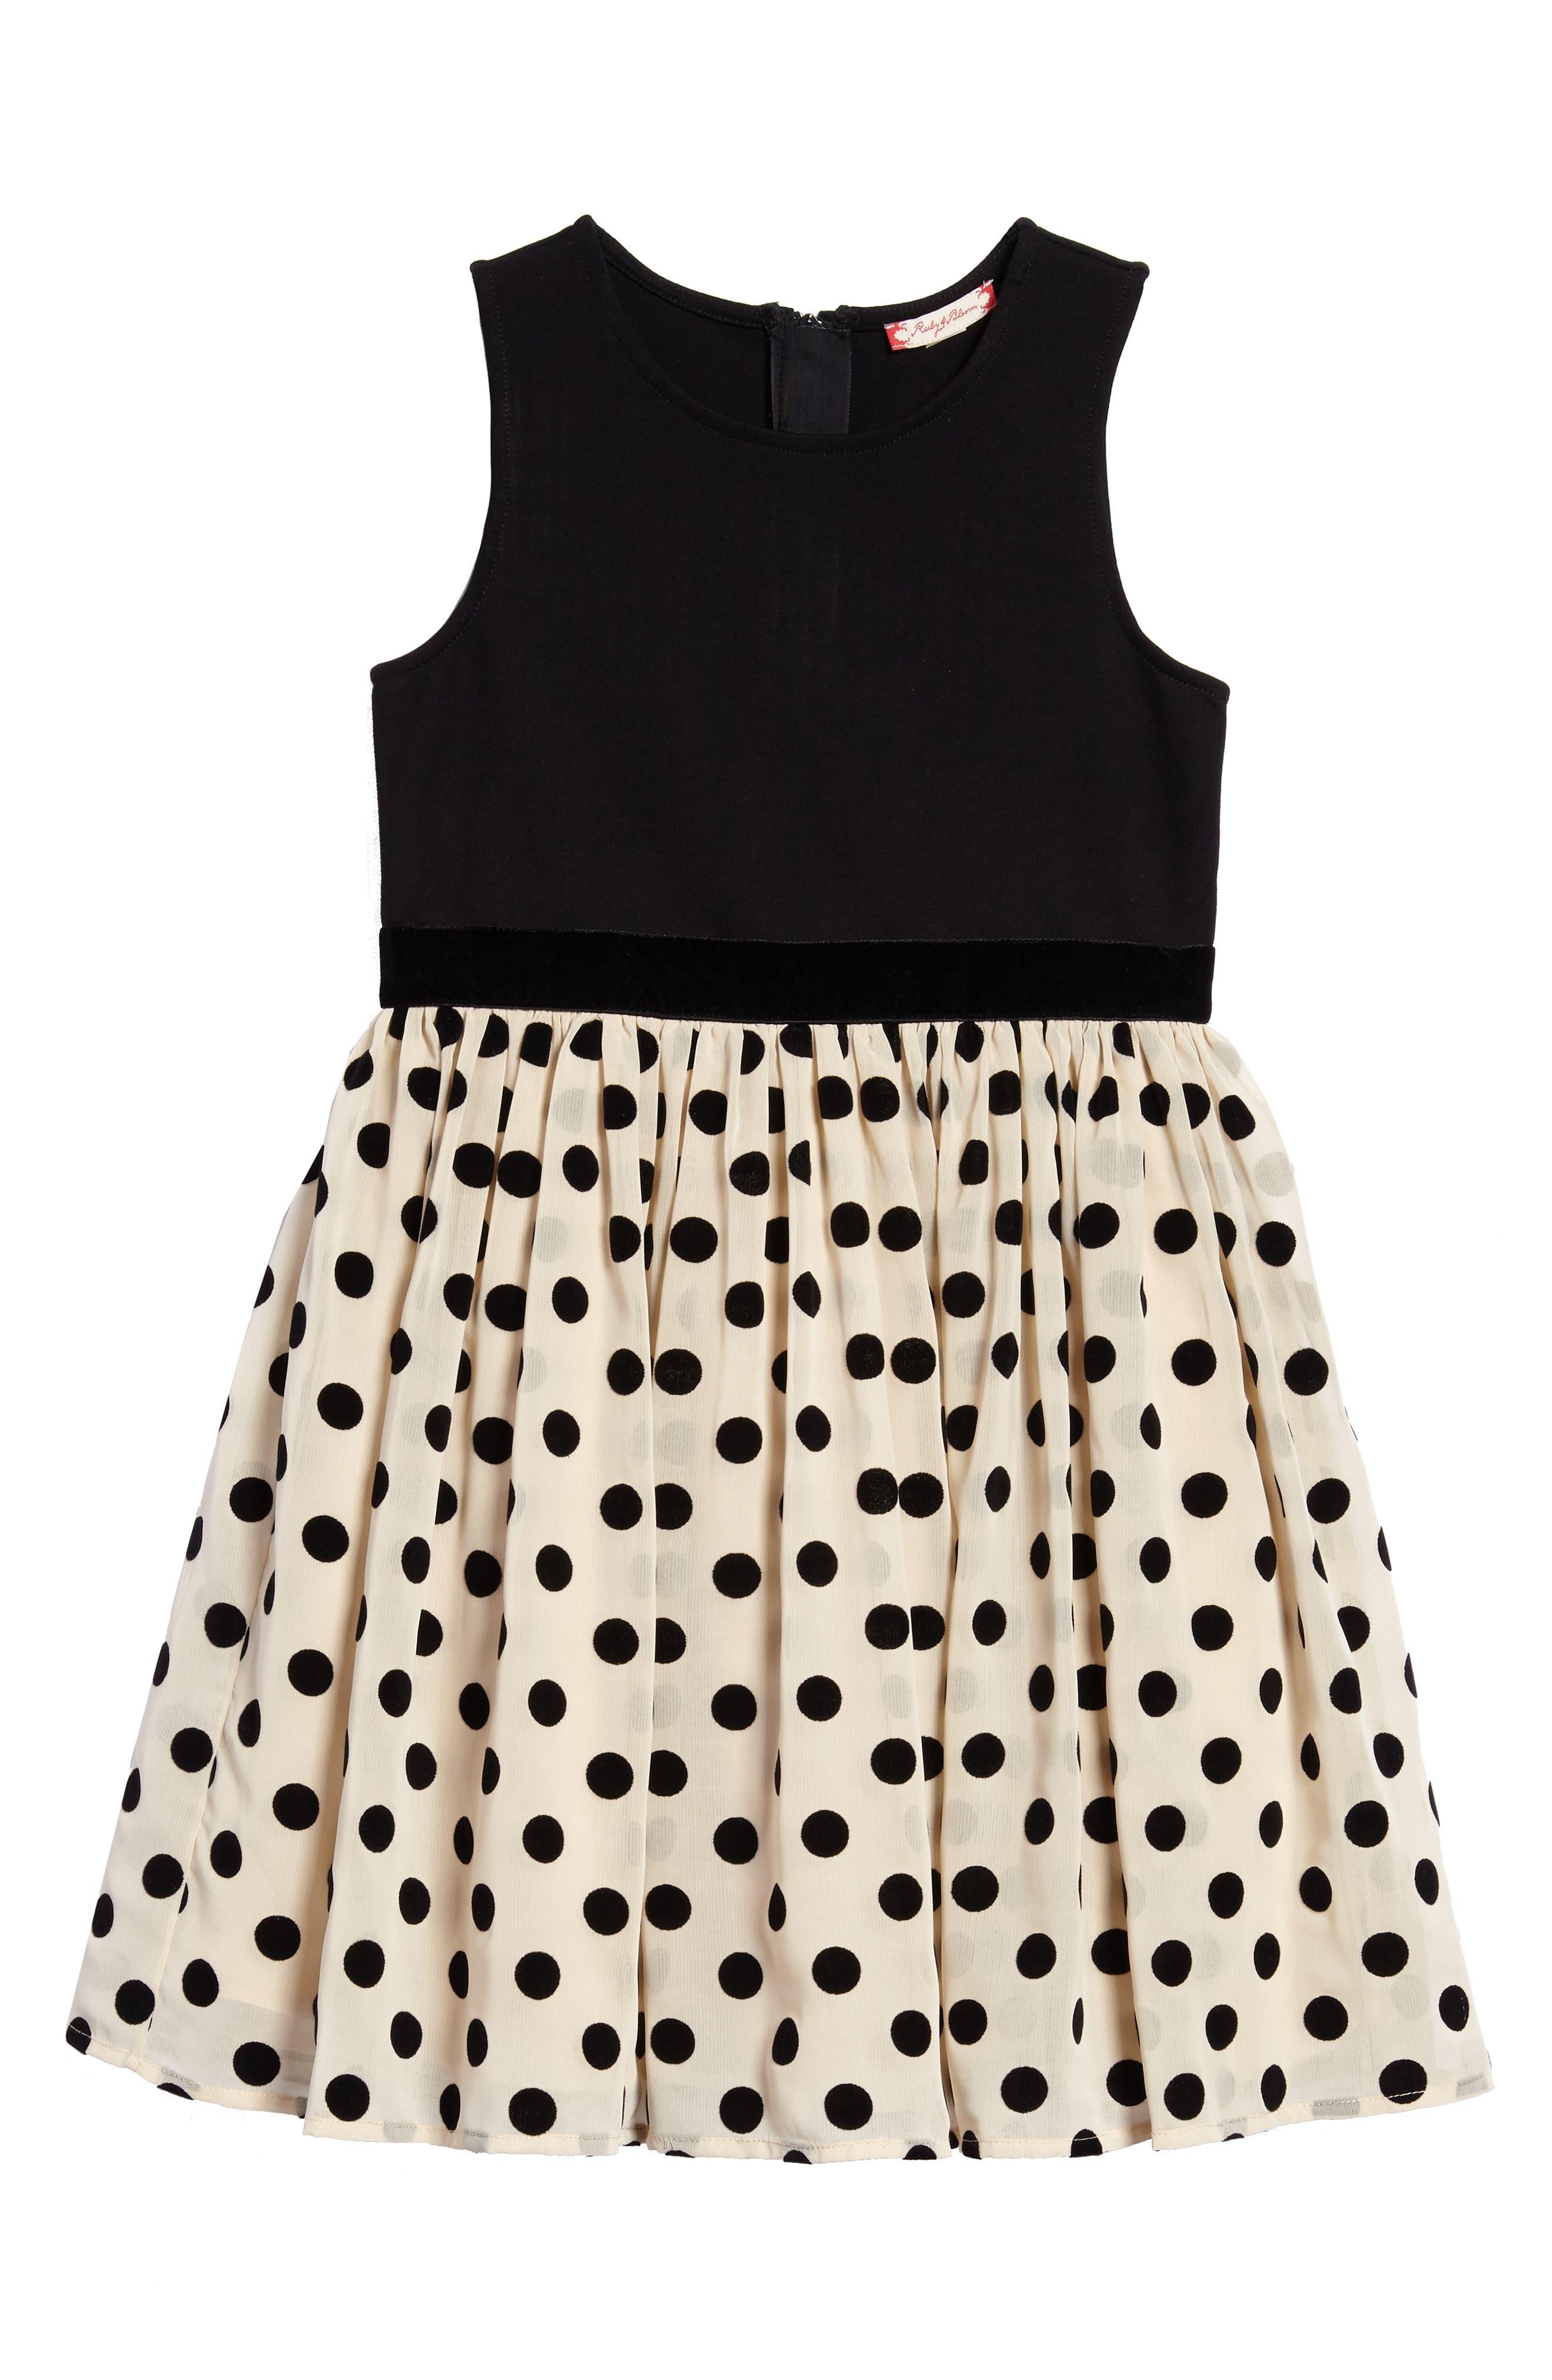 Alternate Image 1 Selected - Ruby & Bloom Mix Media Party Dress (Toddler Girls, Little Girls & Big Girls)